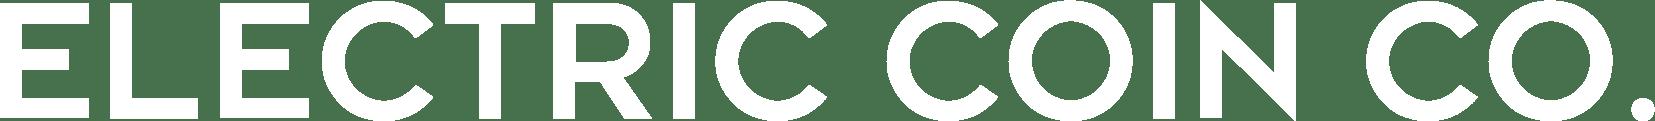 White Electric Coin Co. Horizontal Wordmark